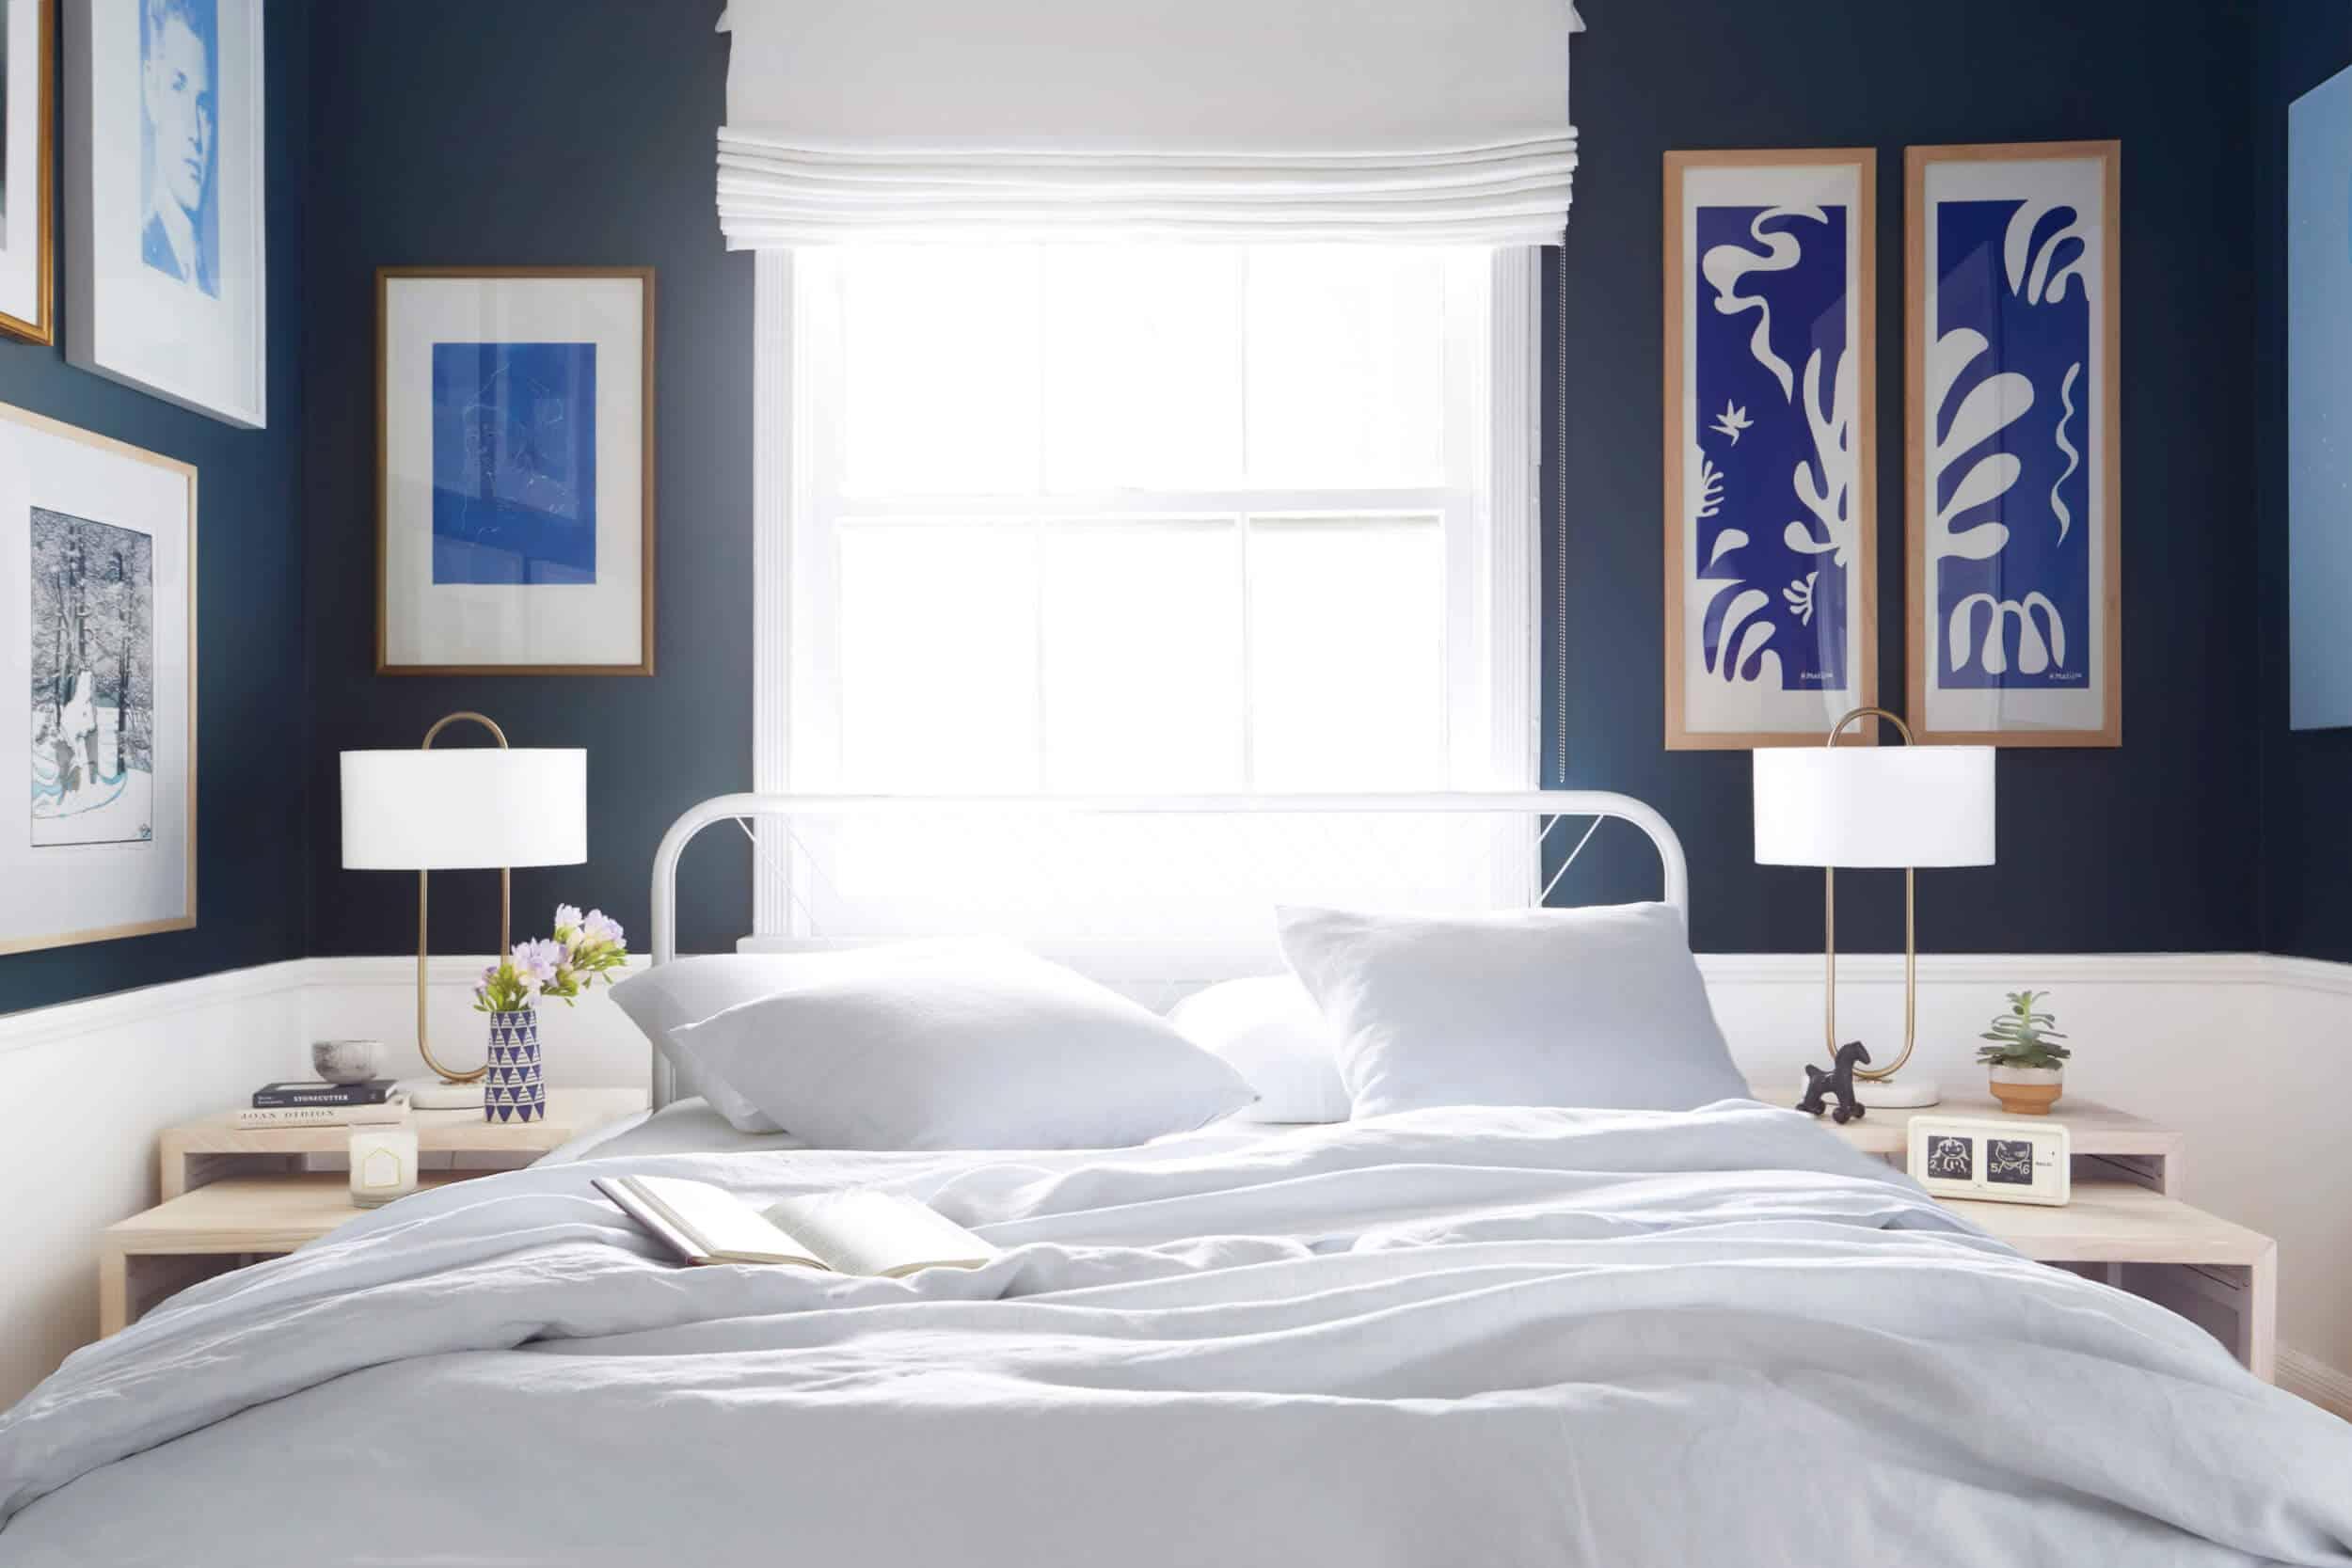 orlando-guest-room-reveal-4